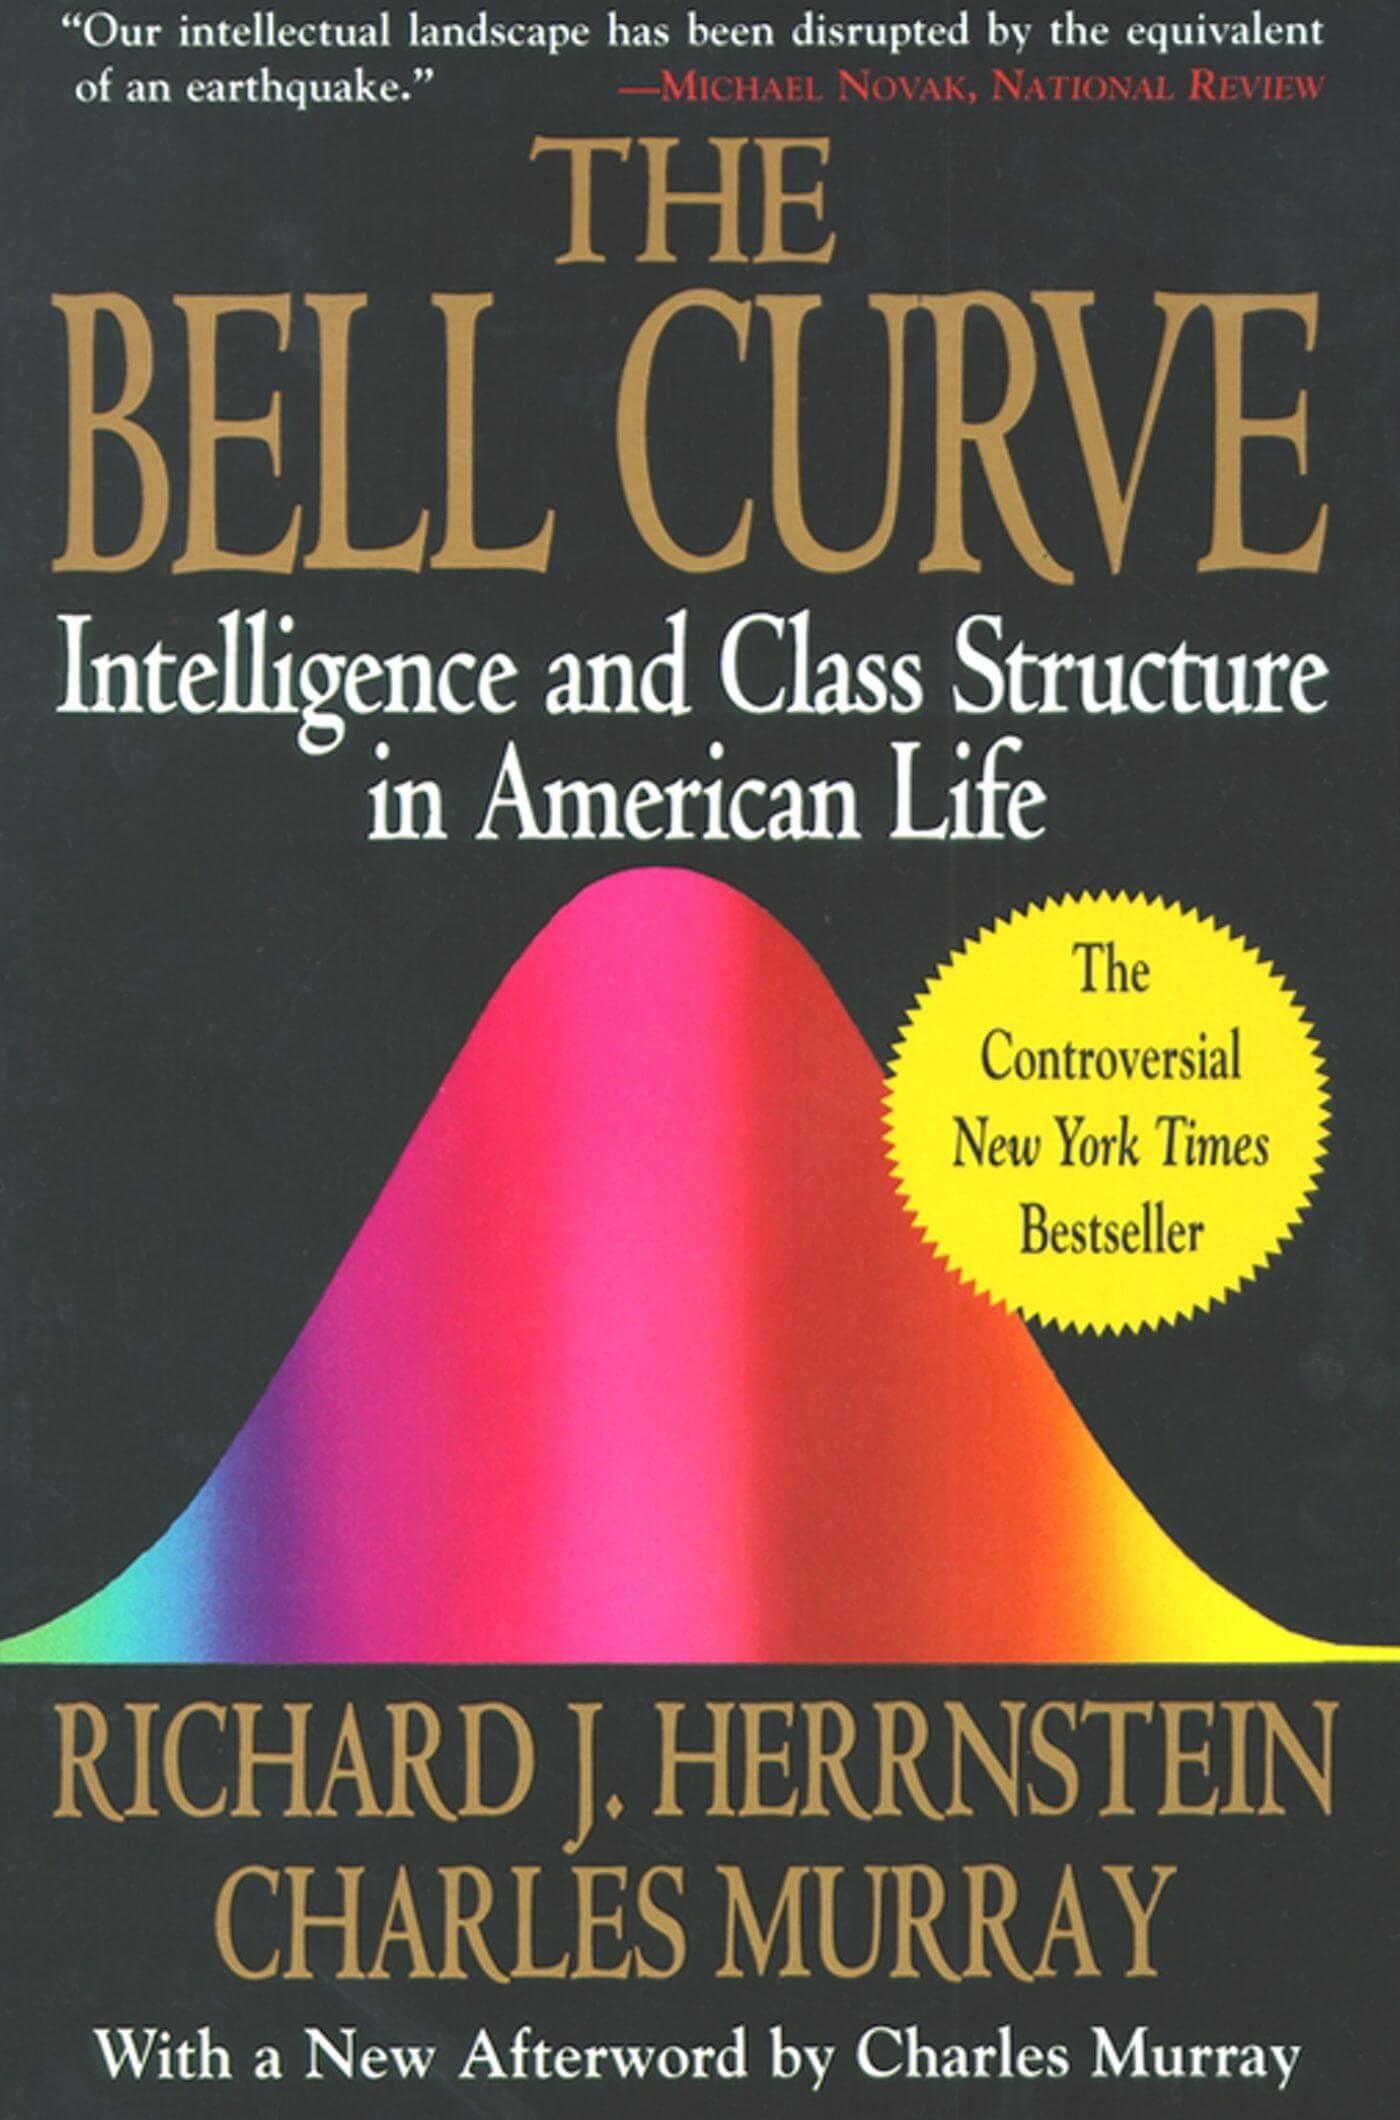 BellCurve1